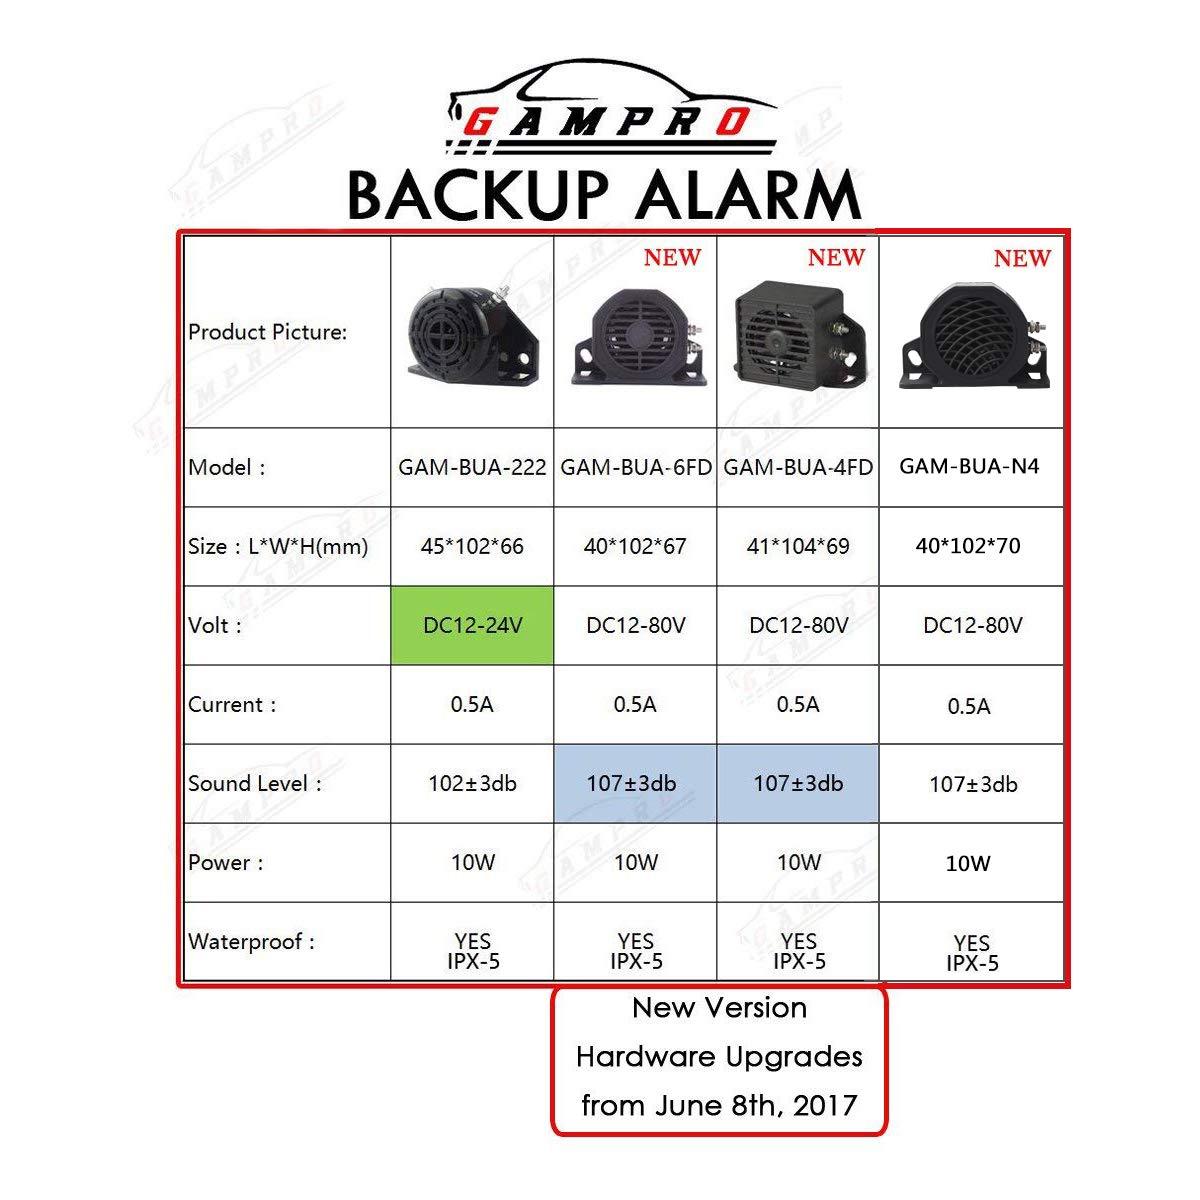 2e5ac93be39 ... GAMPRO 12V-80V 107dB Waterproof Heavy-Duty Backup Warning Alarm with  Super Loud Beeper ...